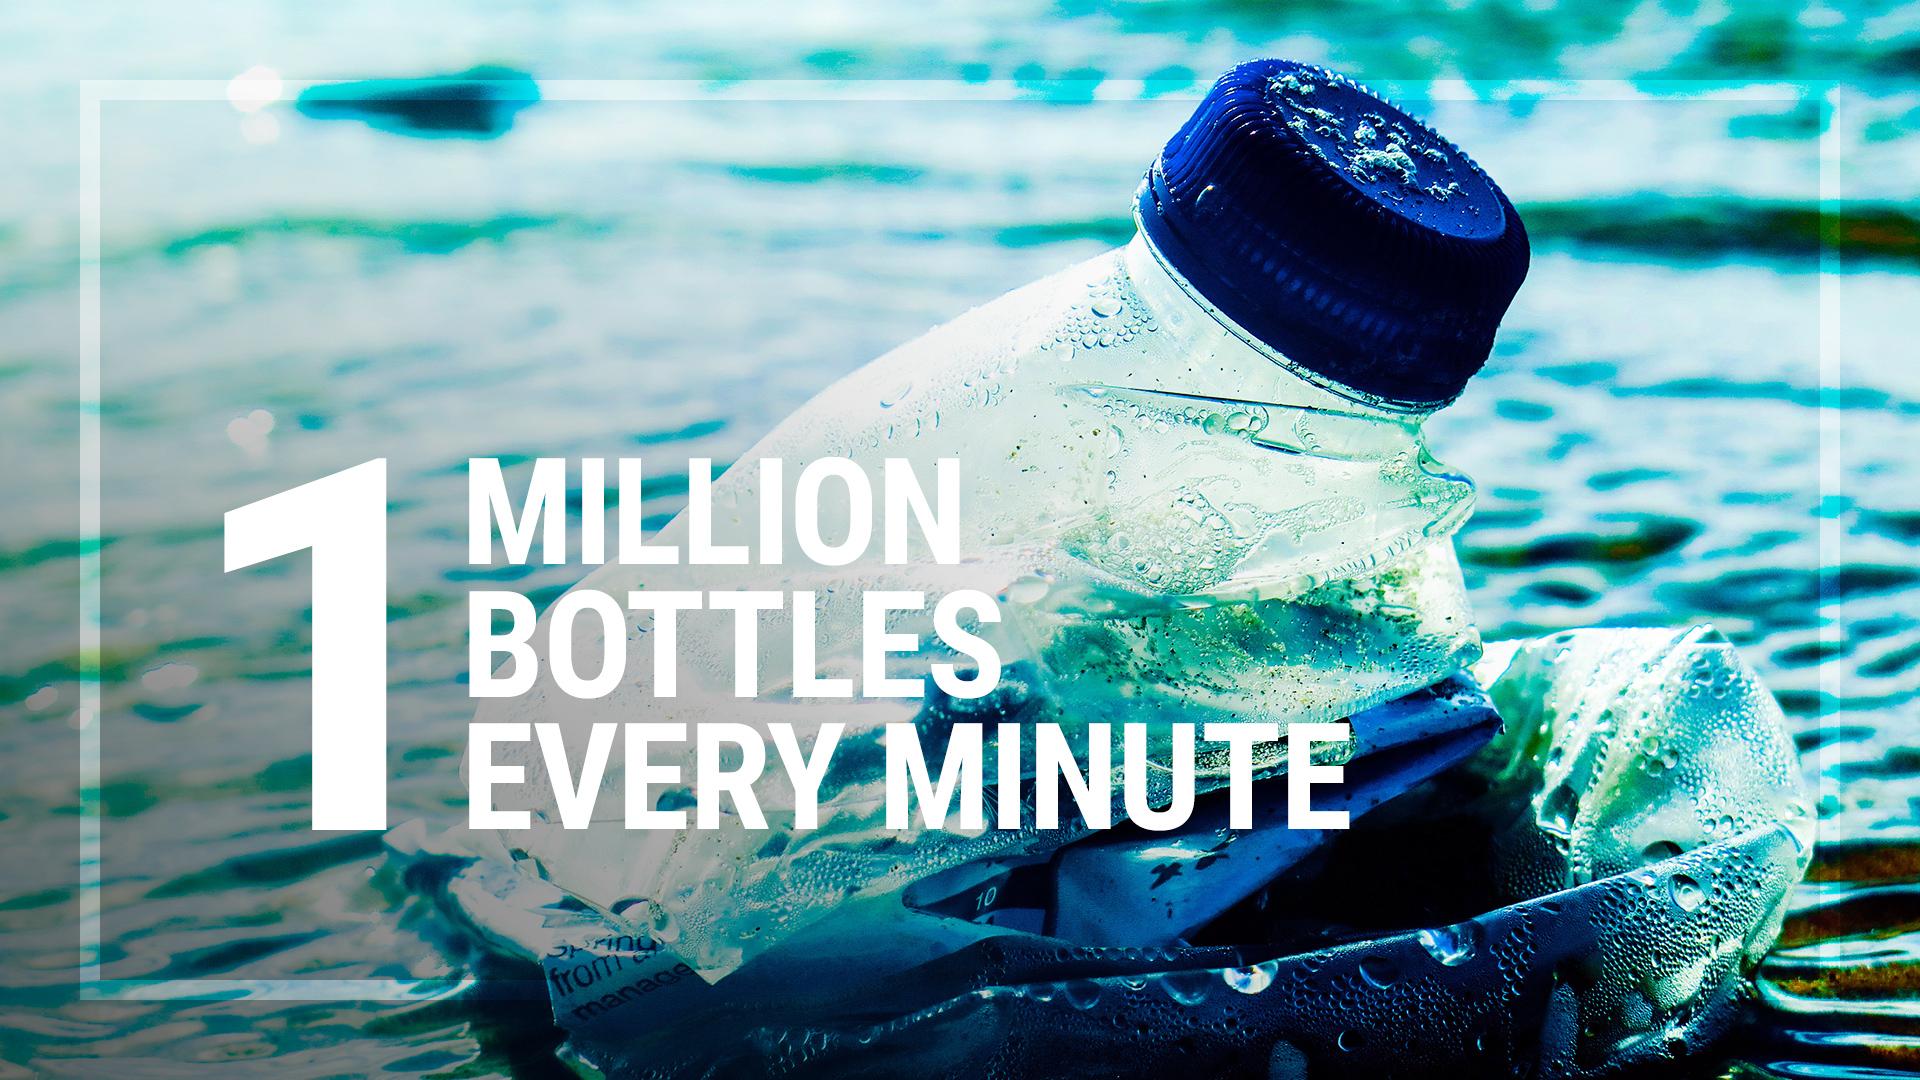 reuse_water_bottle_plastic_change_